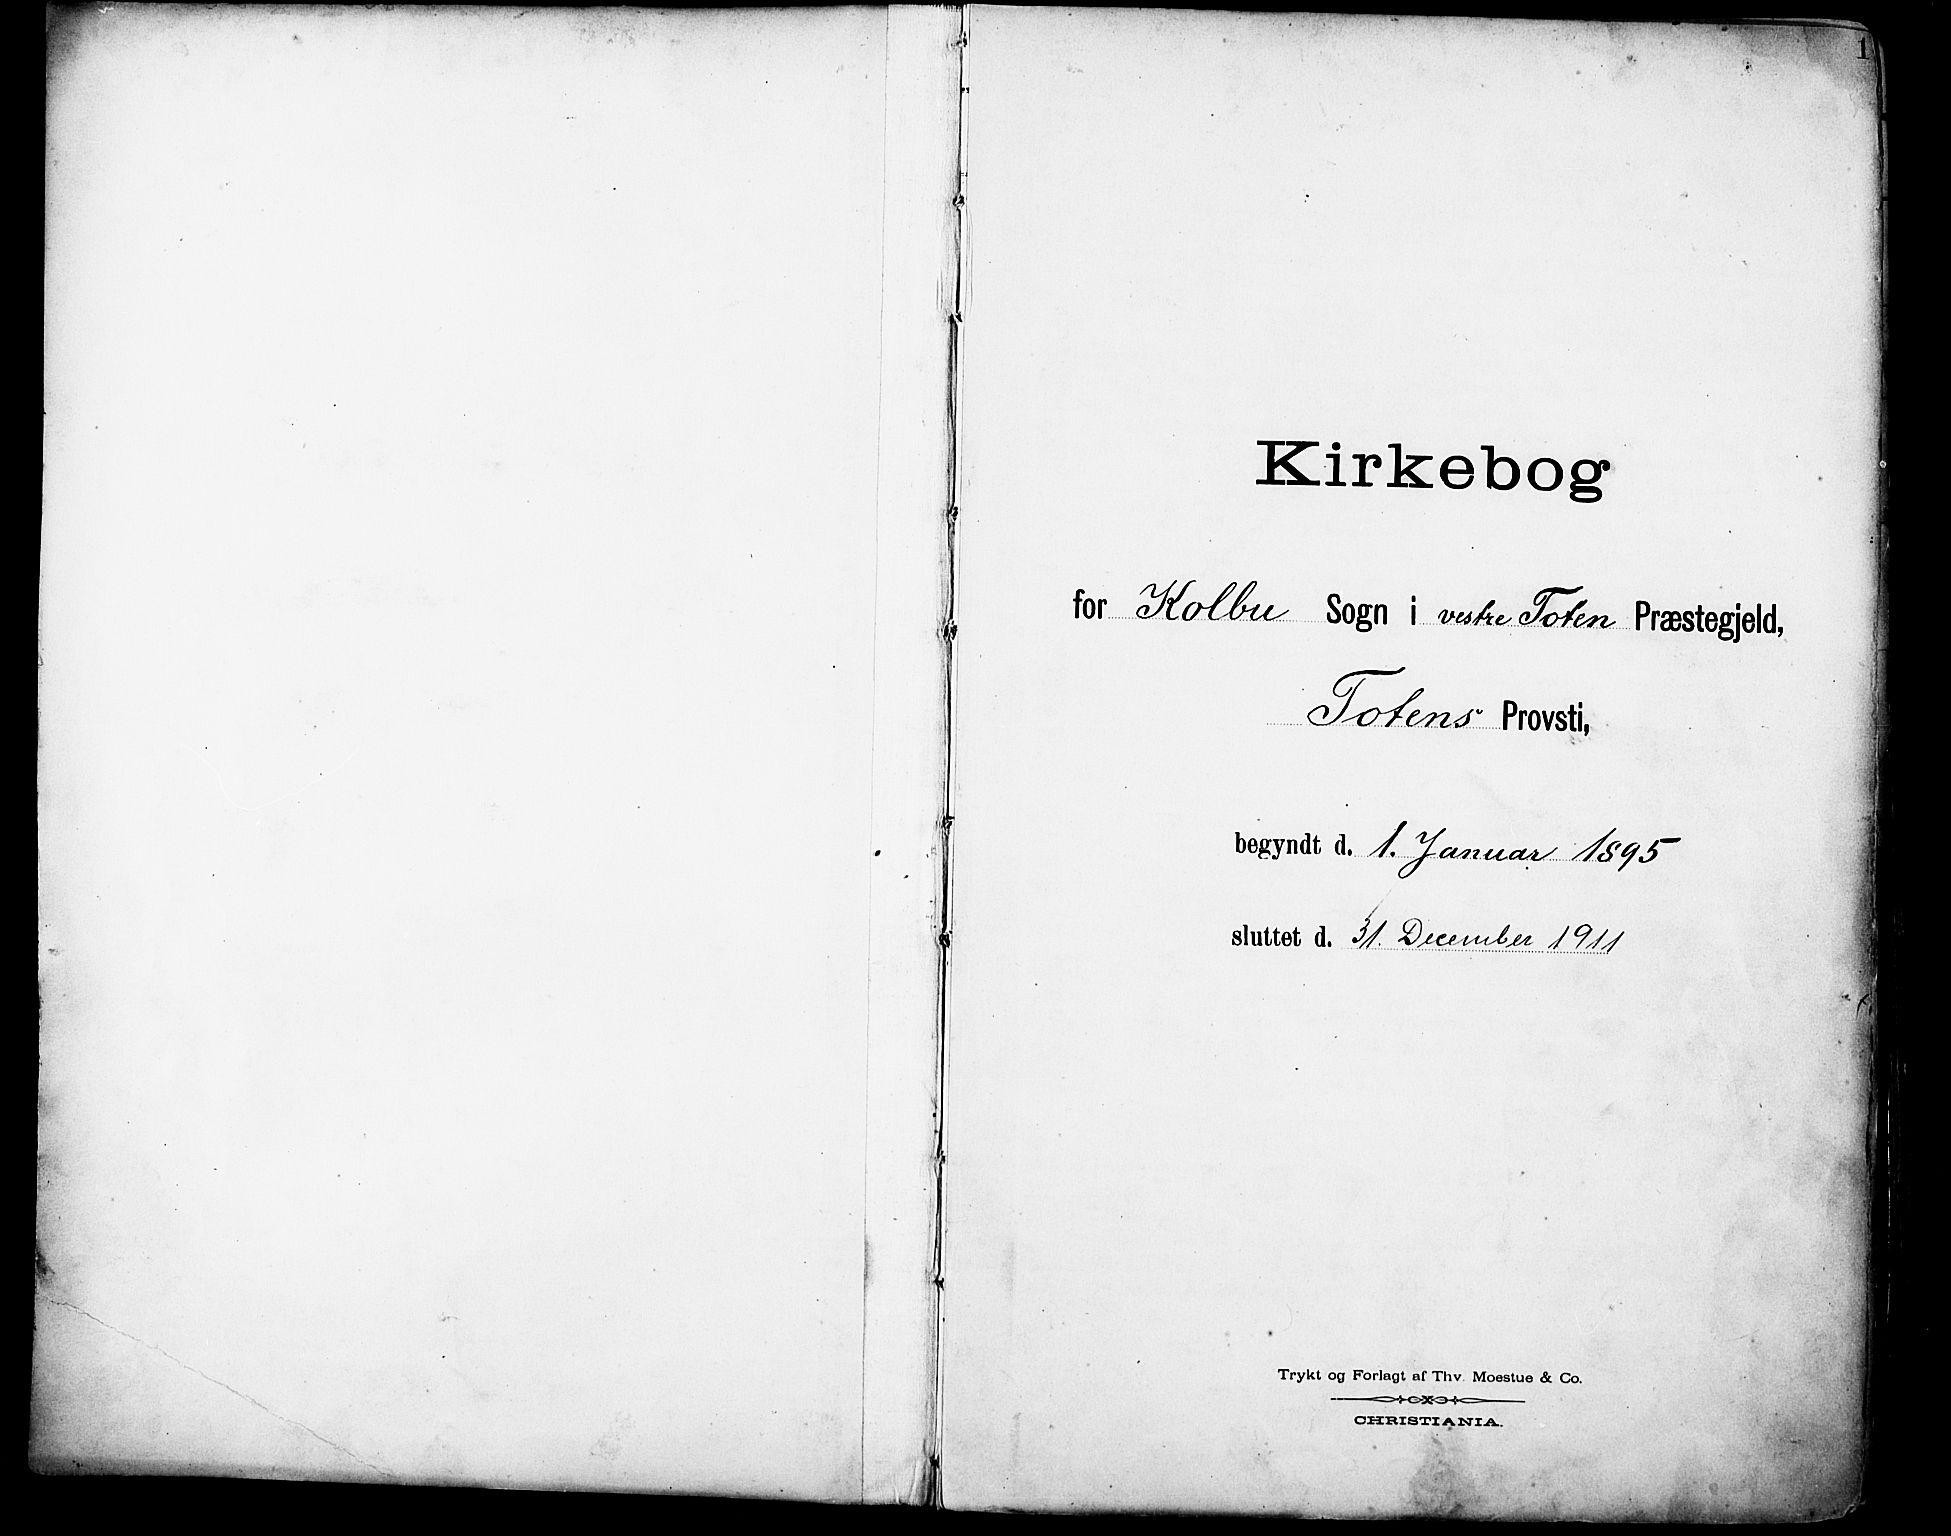 SAH, Vestre Toten prestekontor, H/Ha/Haa/L0013: Parish register (official) no. 13, 1895-1911, p. 1